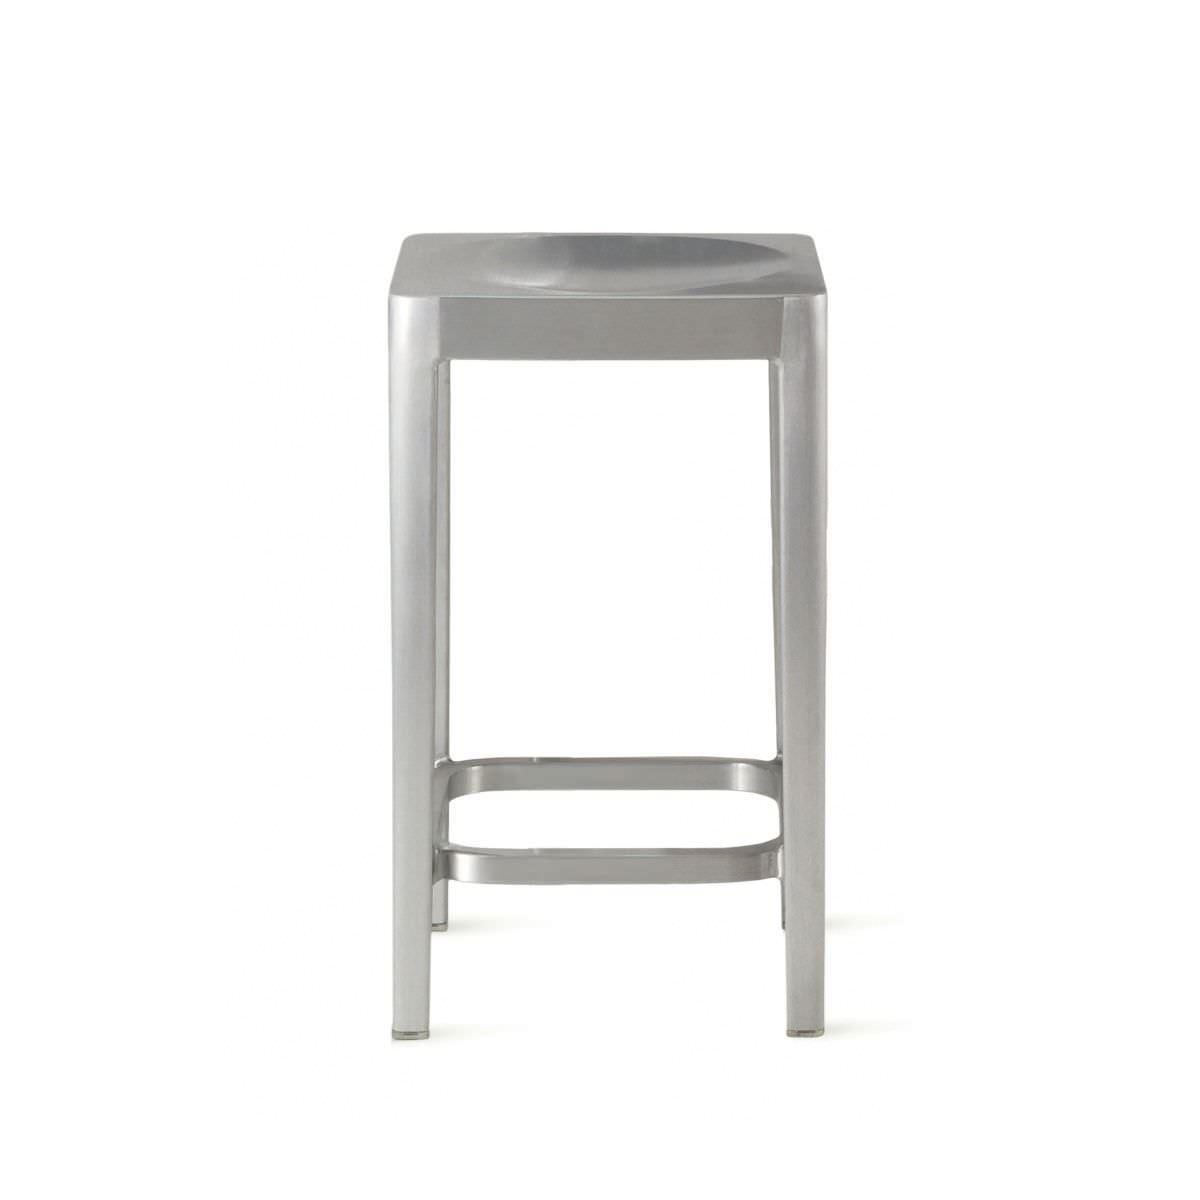 Tabouret Contemporain De En Bar Aluminium Par Philippe Starck TlKF1Jc3